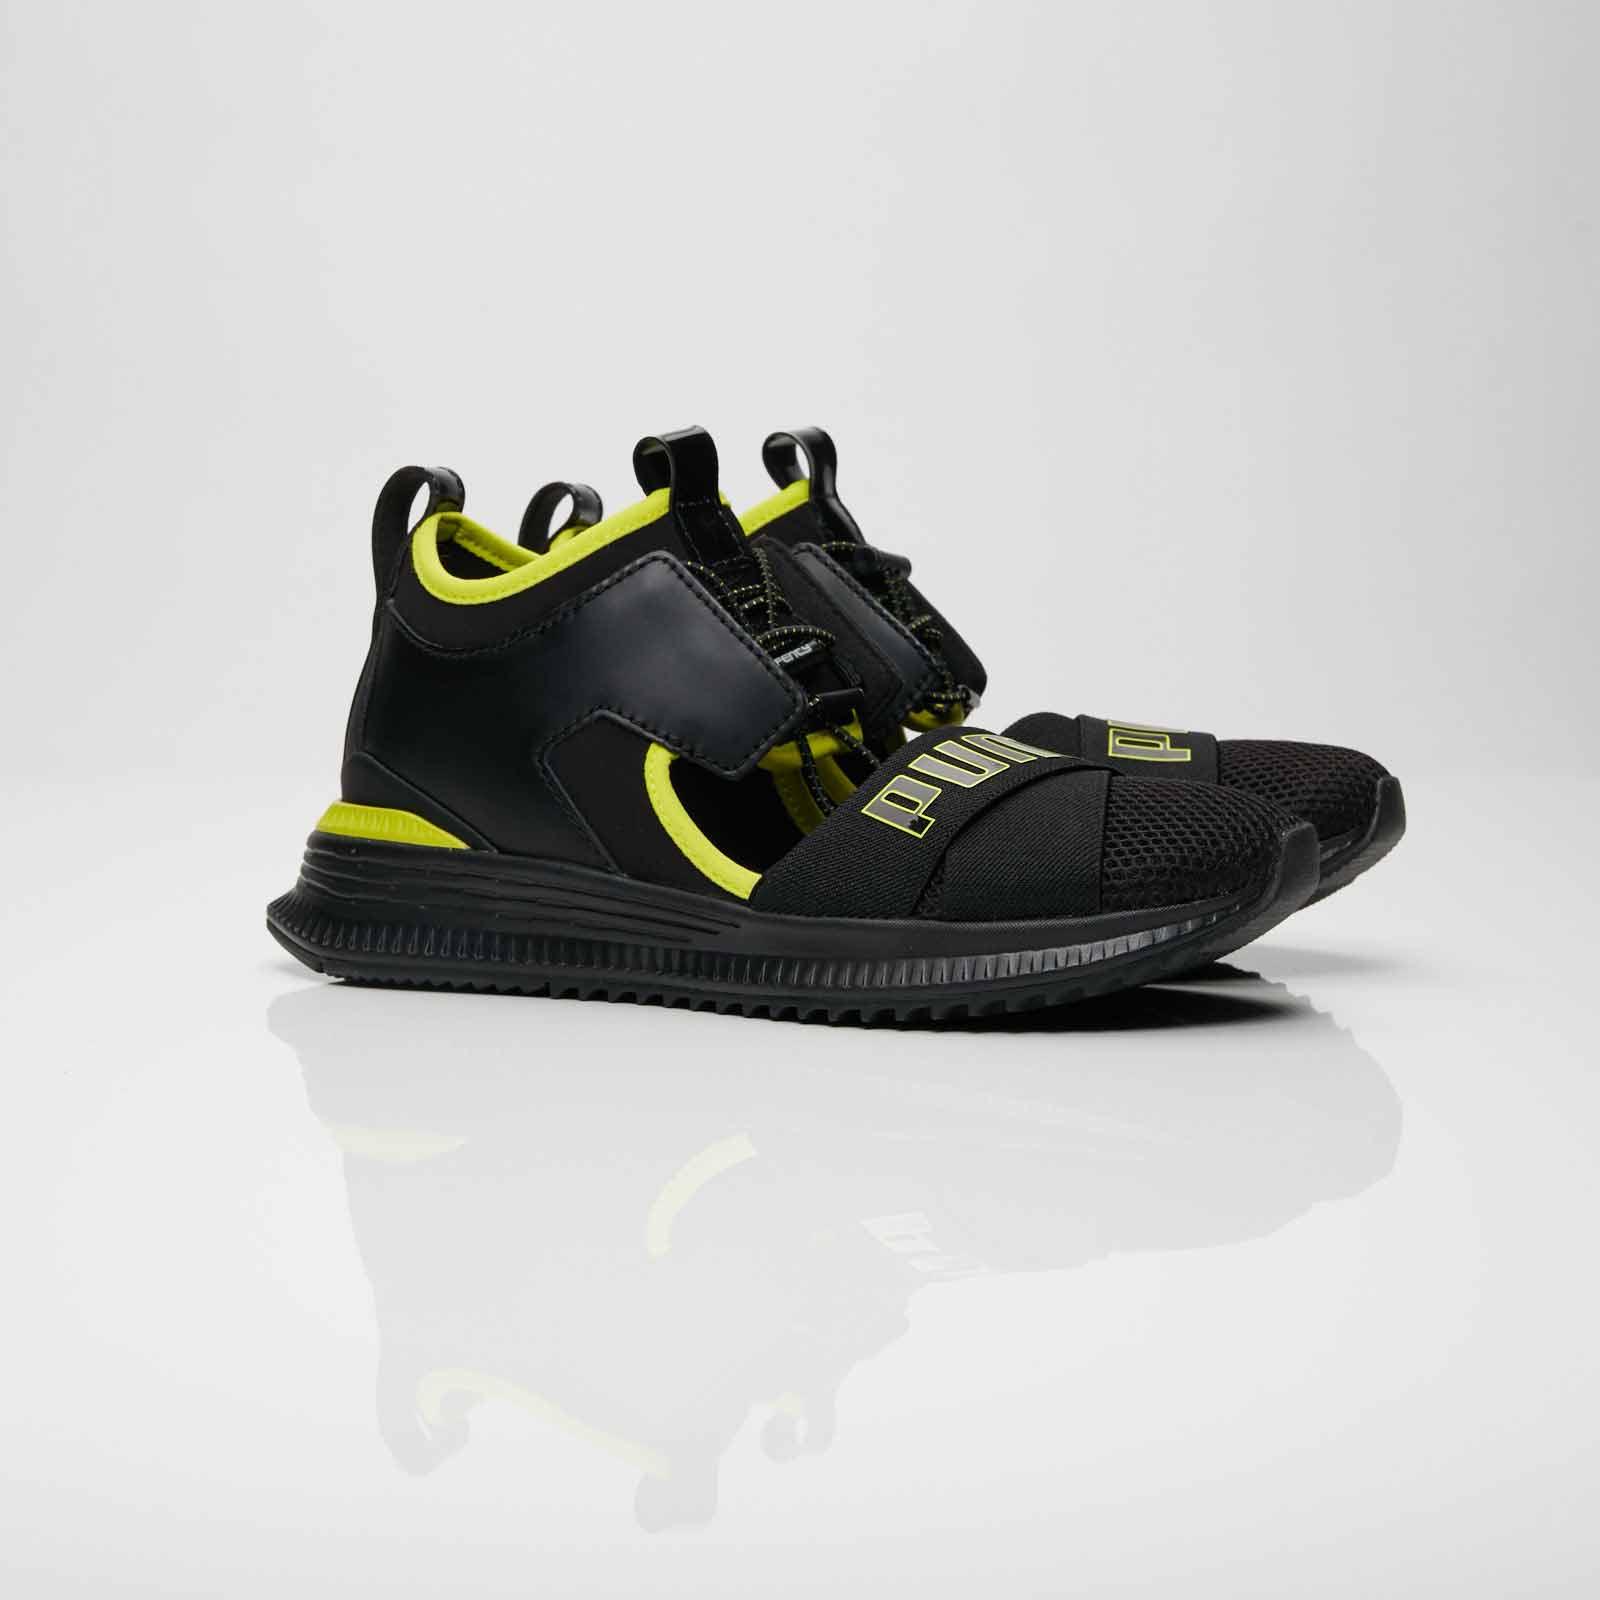 huge discount c1a2f 4d0b4 Puma Fenty Avid Wns - 367683-01 - Sneakersnstuff | sneakers ...